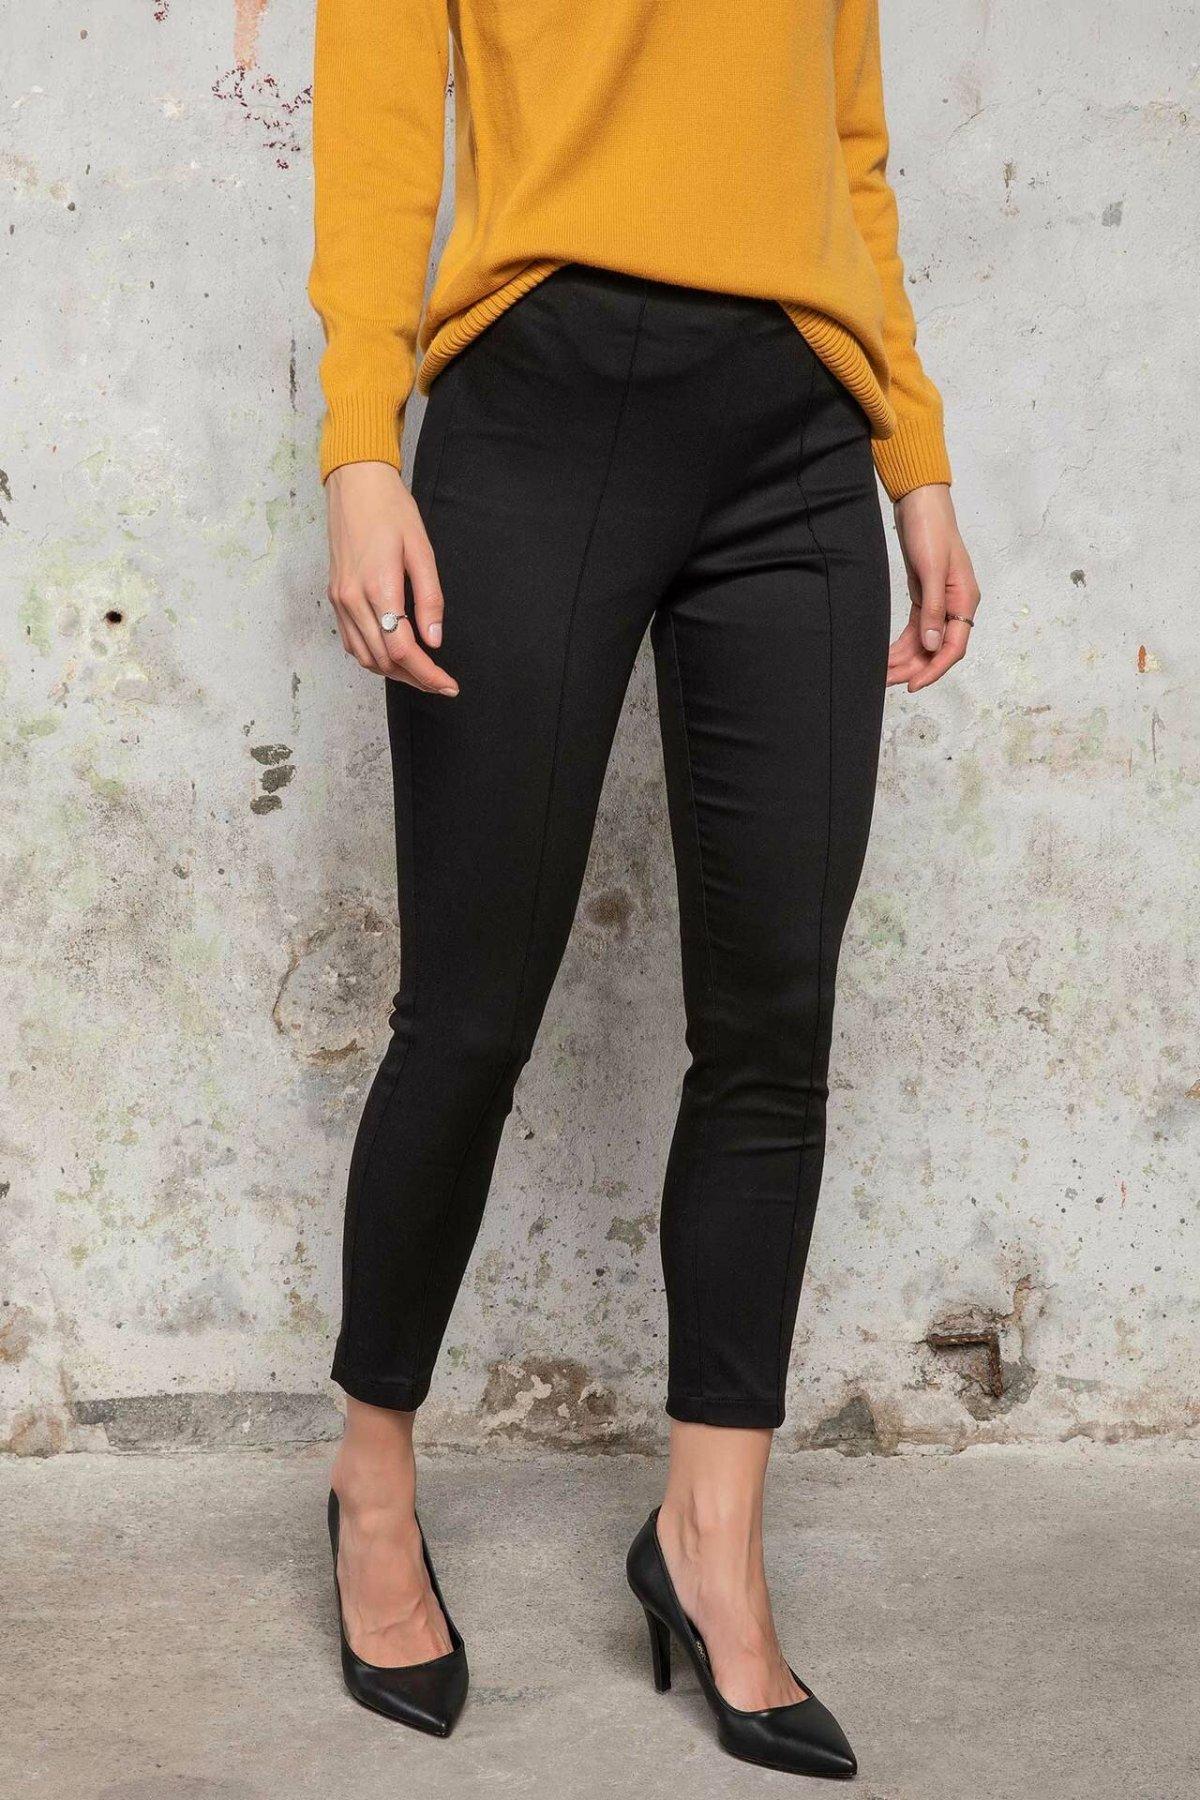 DeFacto Women Cotton Skinny Trousers Female Casual Comfort Pencil Pants High Qualilty Crop Pant Female -K3008AZ18WN